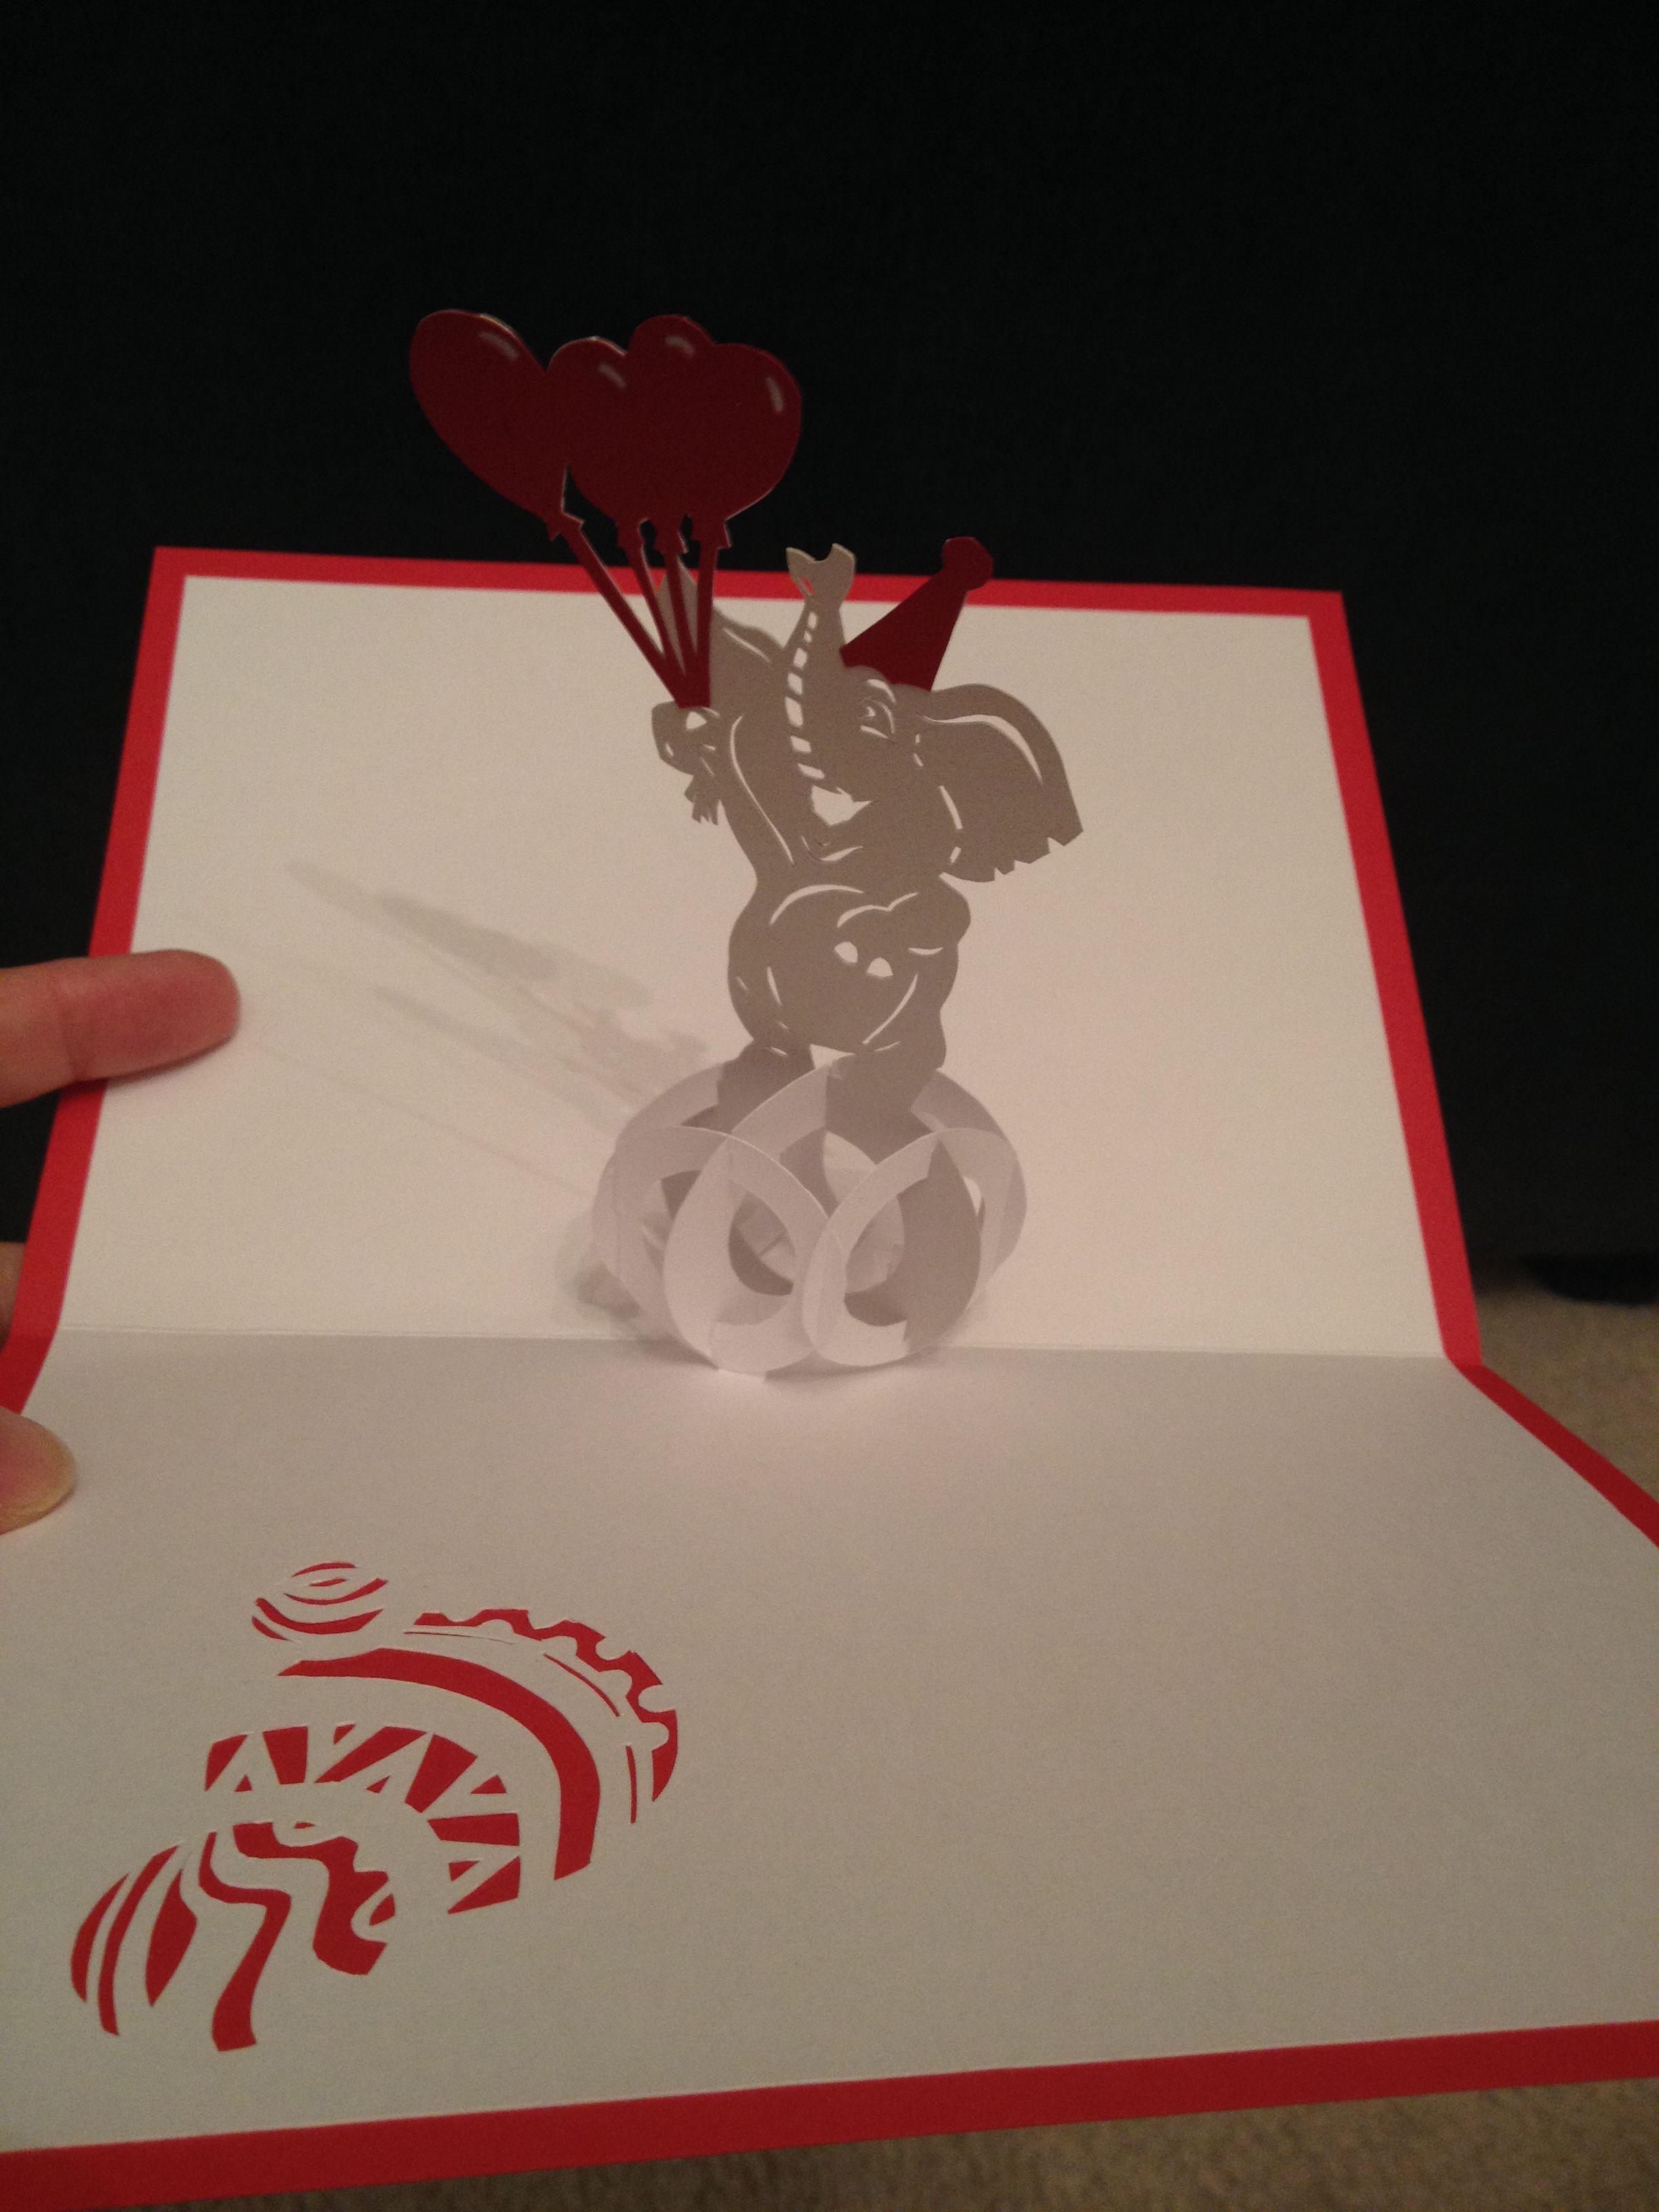 Circus Elephant On A Ball Sliceform Pop Up Template From Cahier De Kirigami No 16 Pop Up Cards Cards Cards Handmade